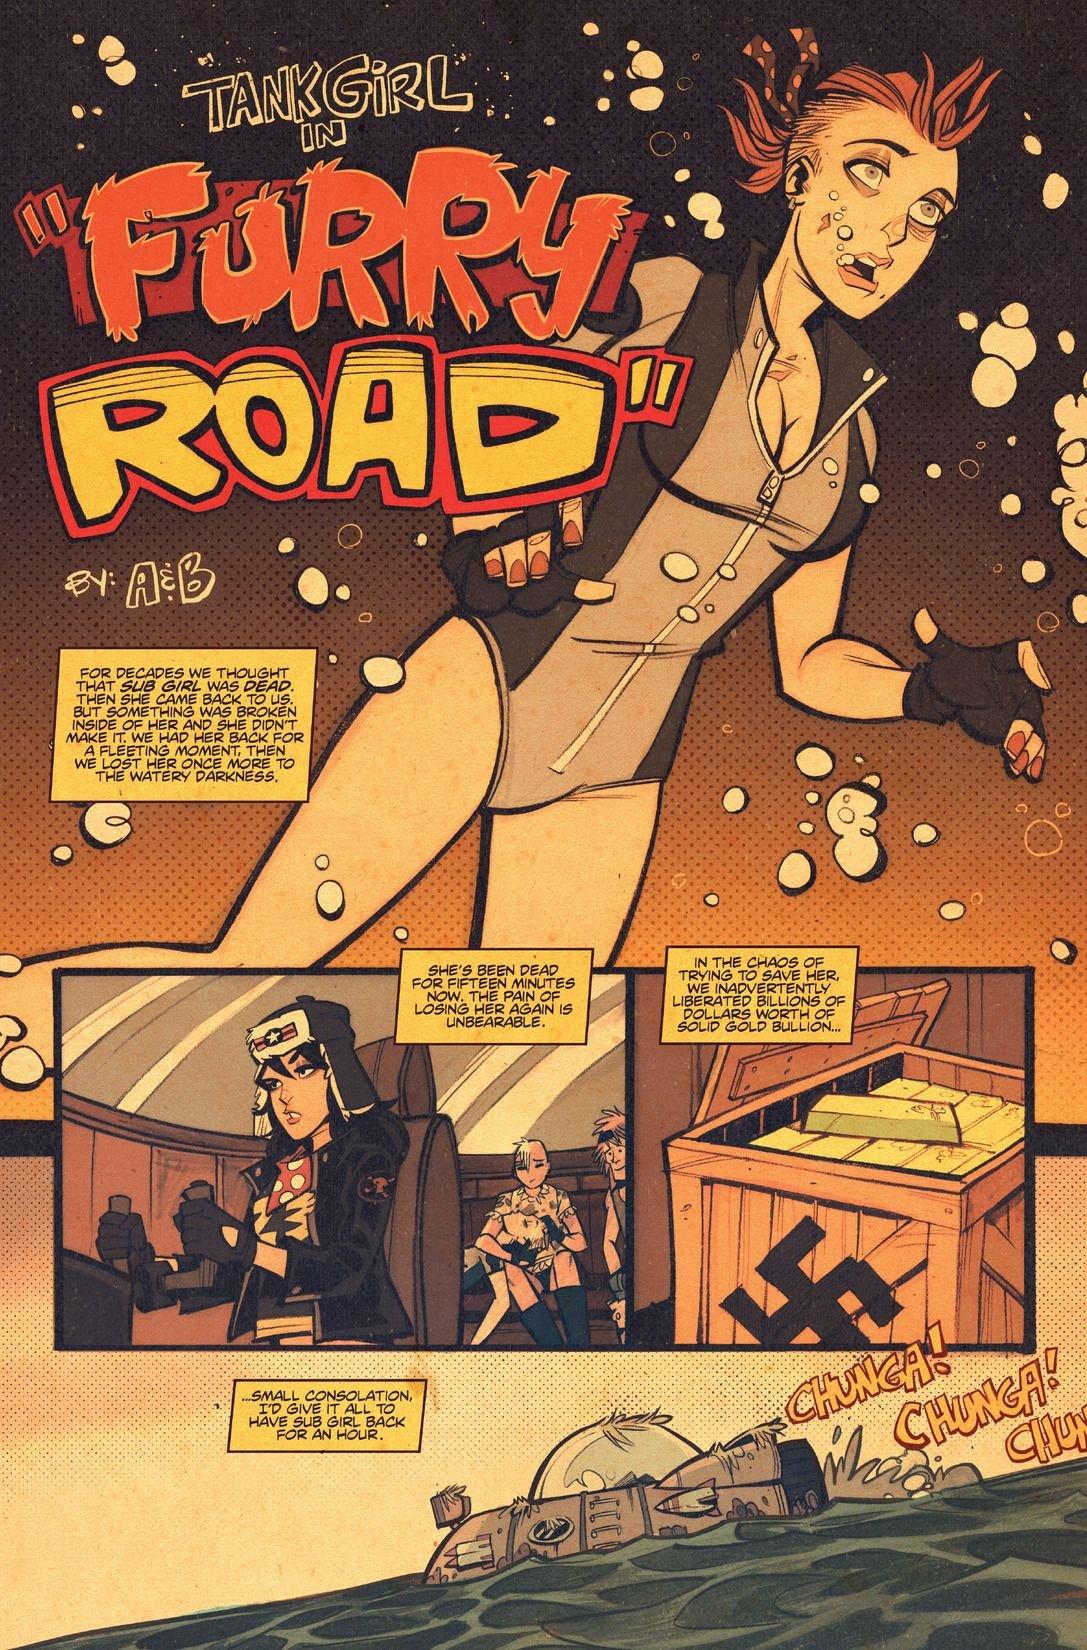 Tank Girl Gold #1 Furry Road (Comic) Review 3